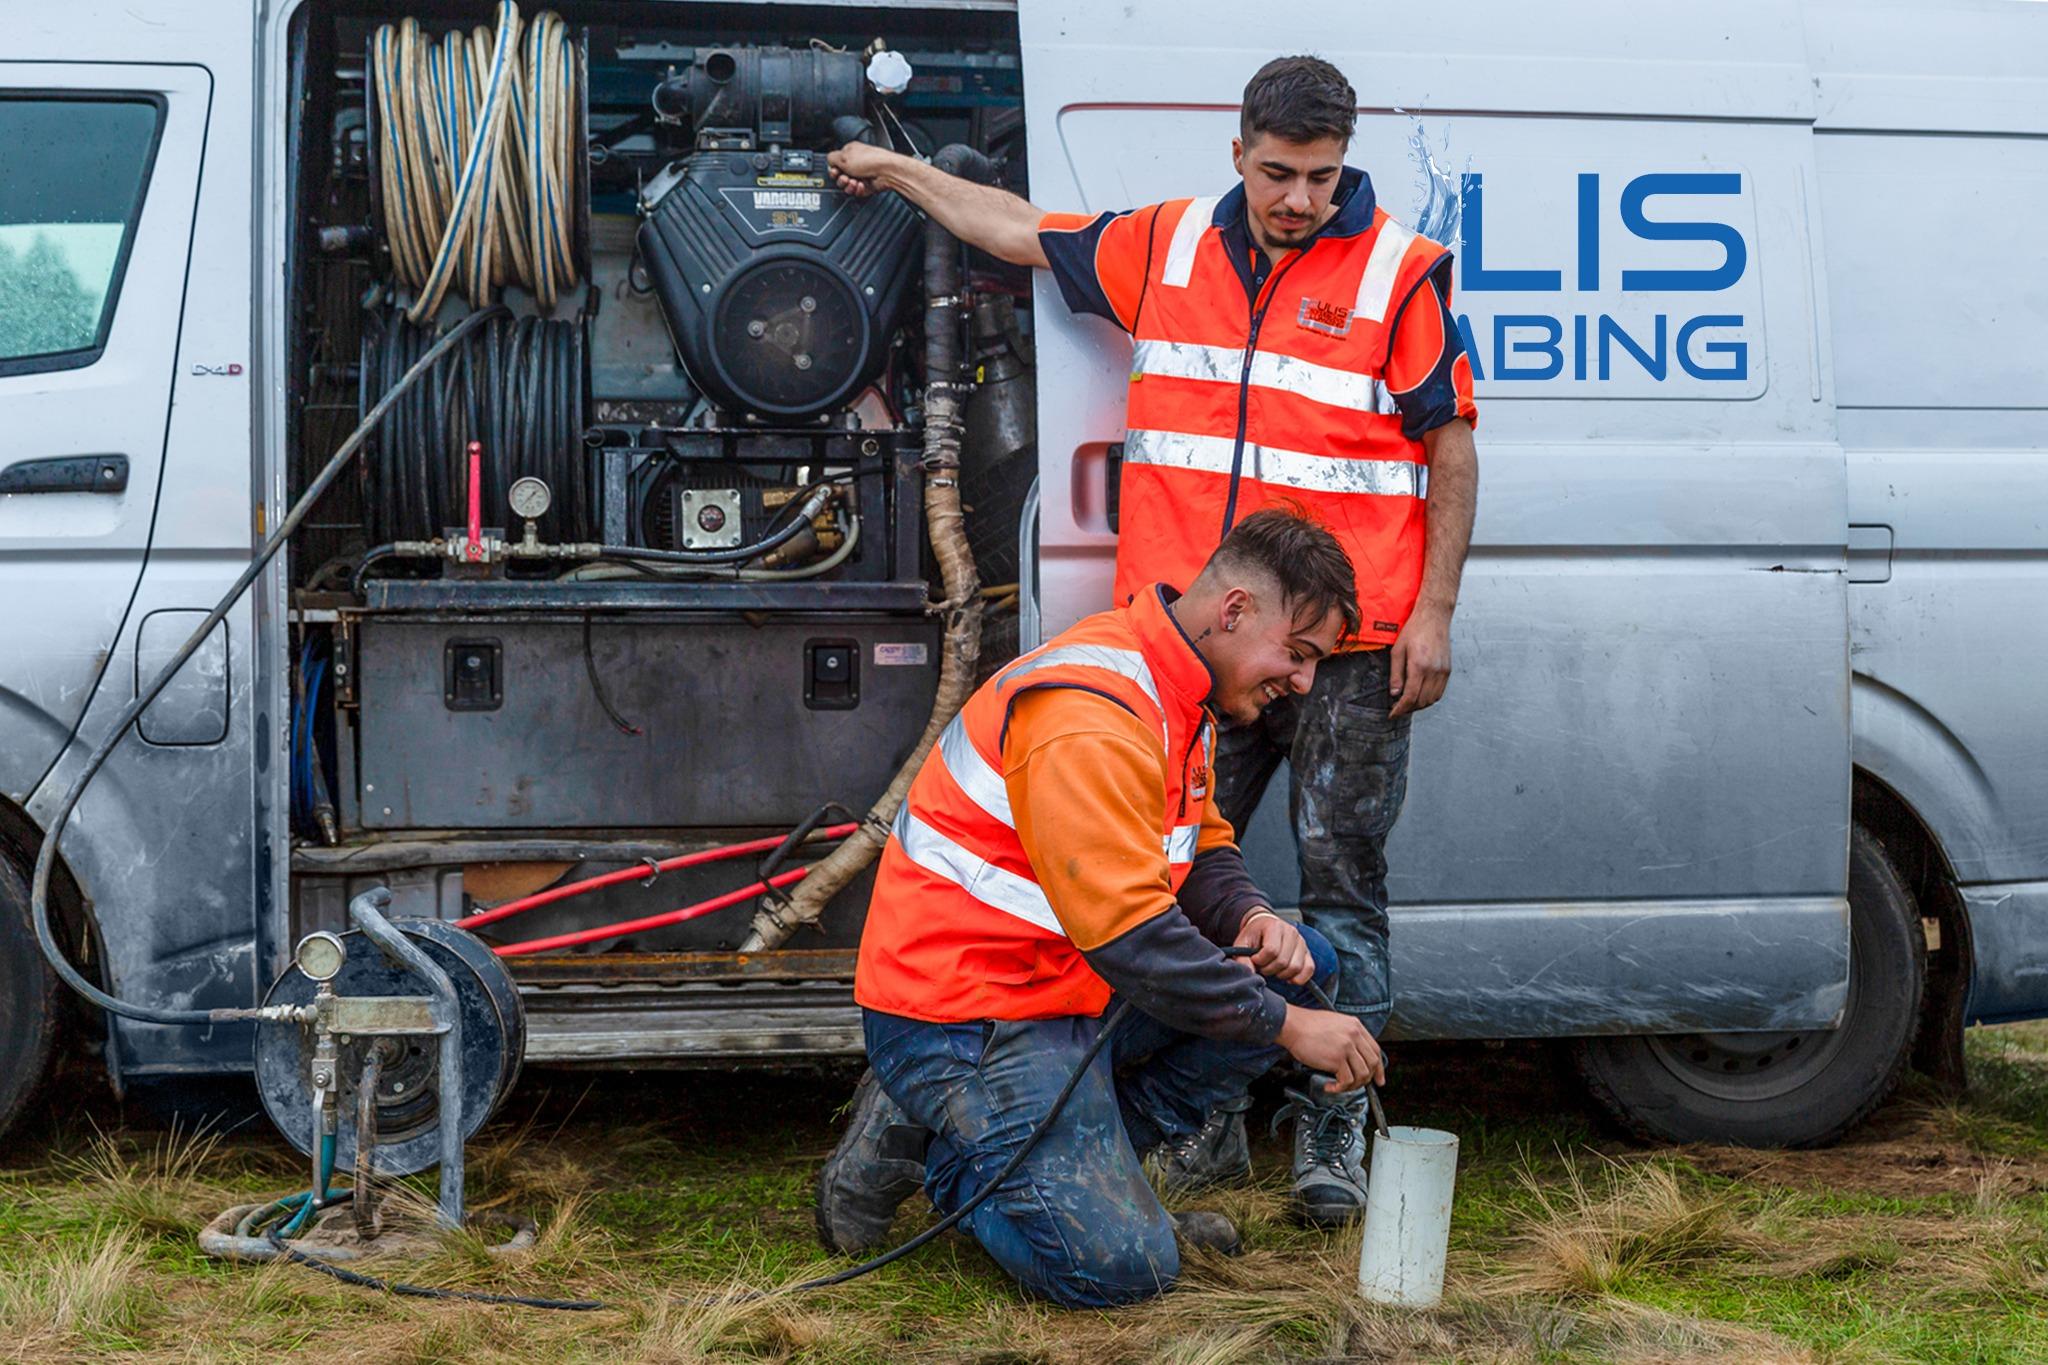 Pulis Plumbing needs more plumbers